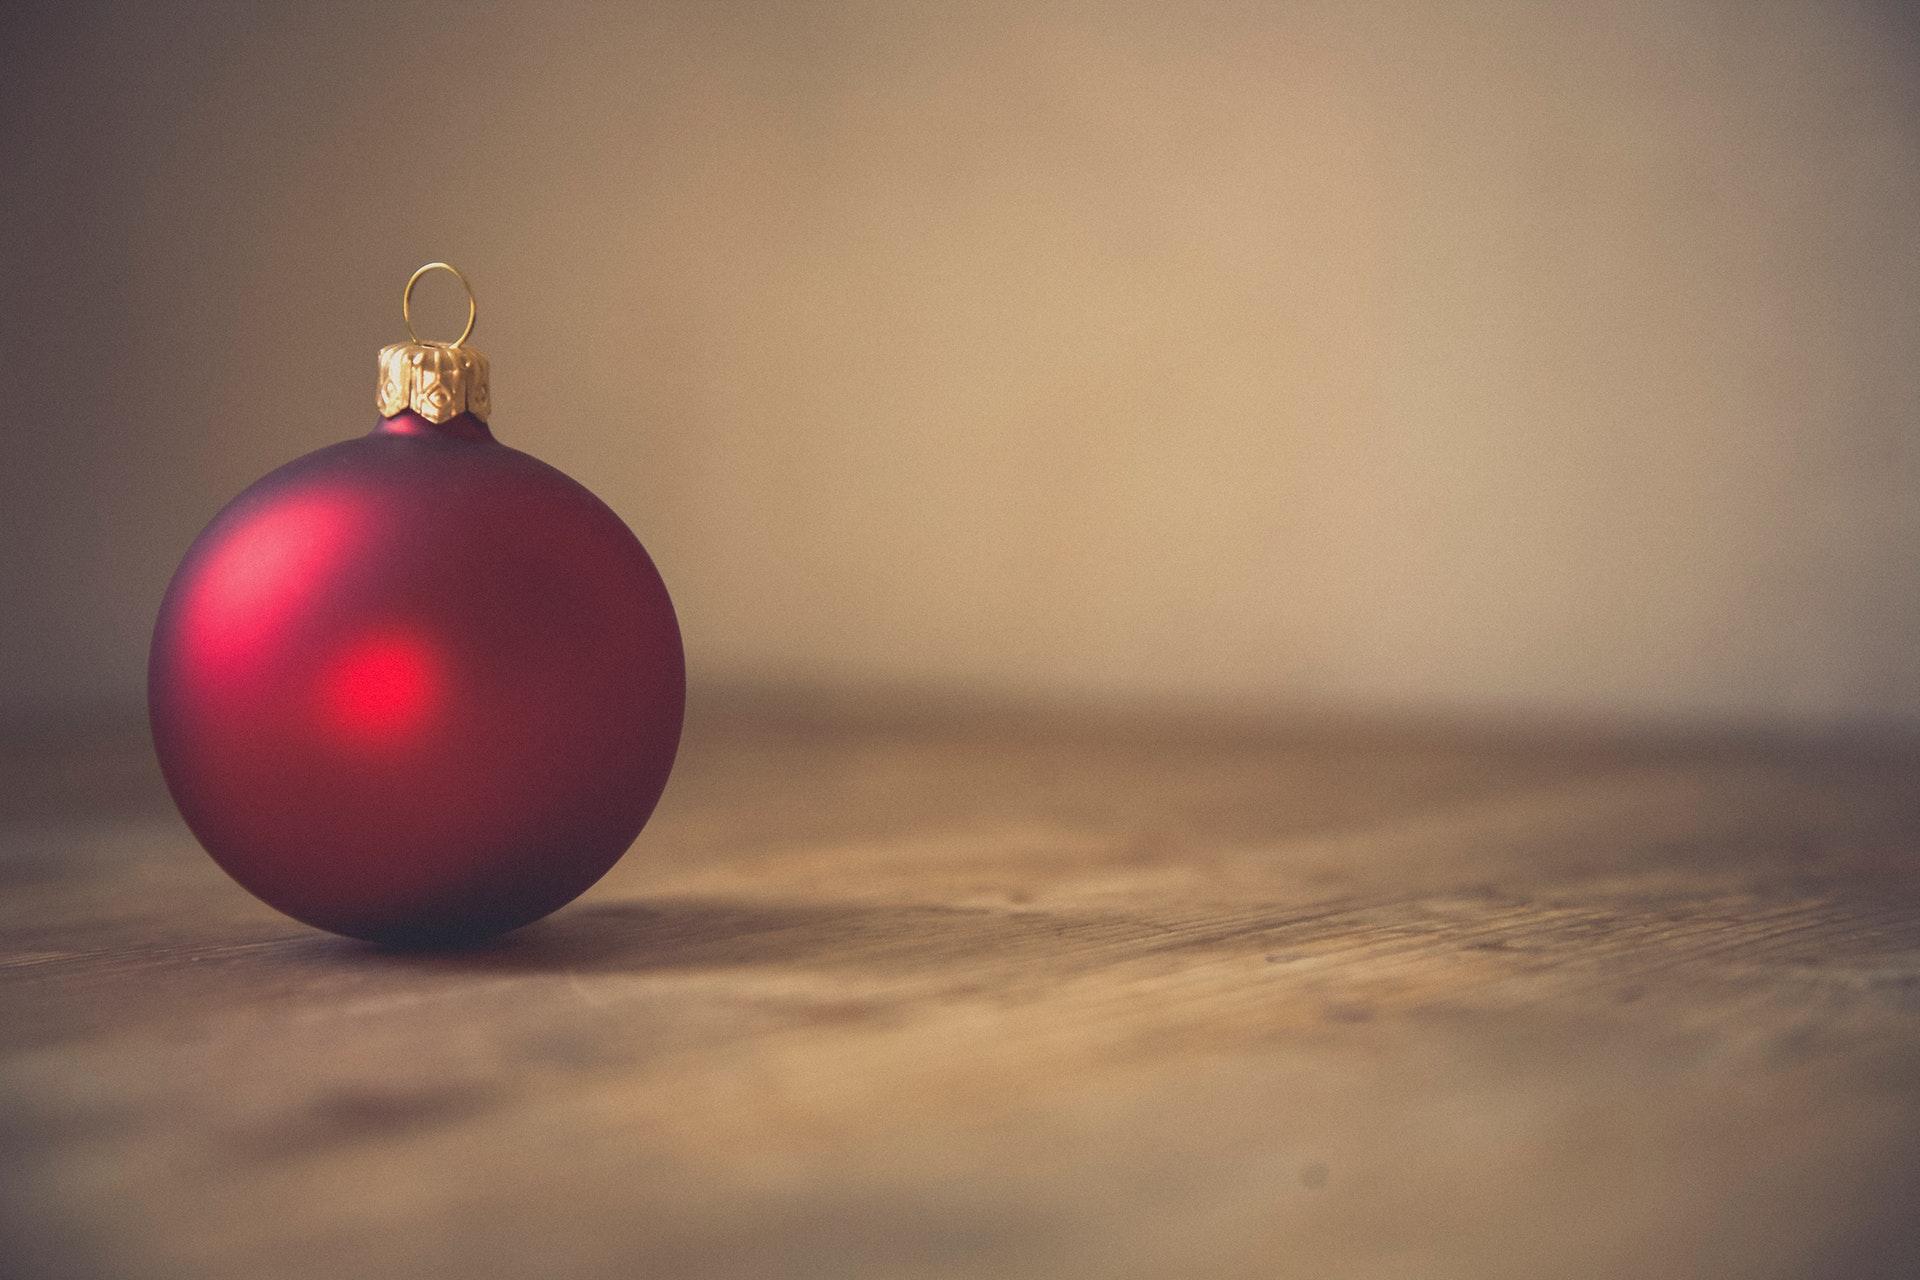 Festive bauble